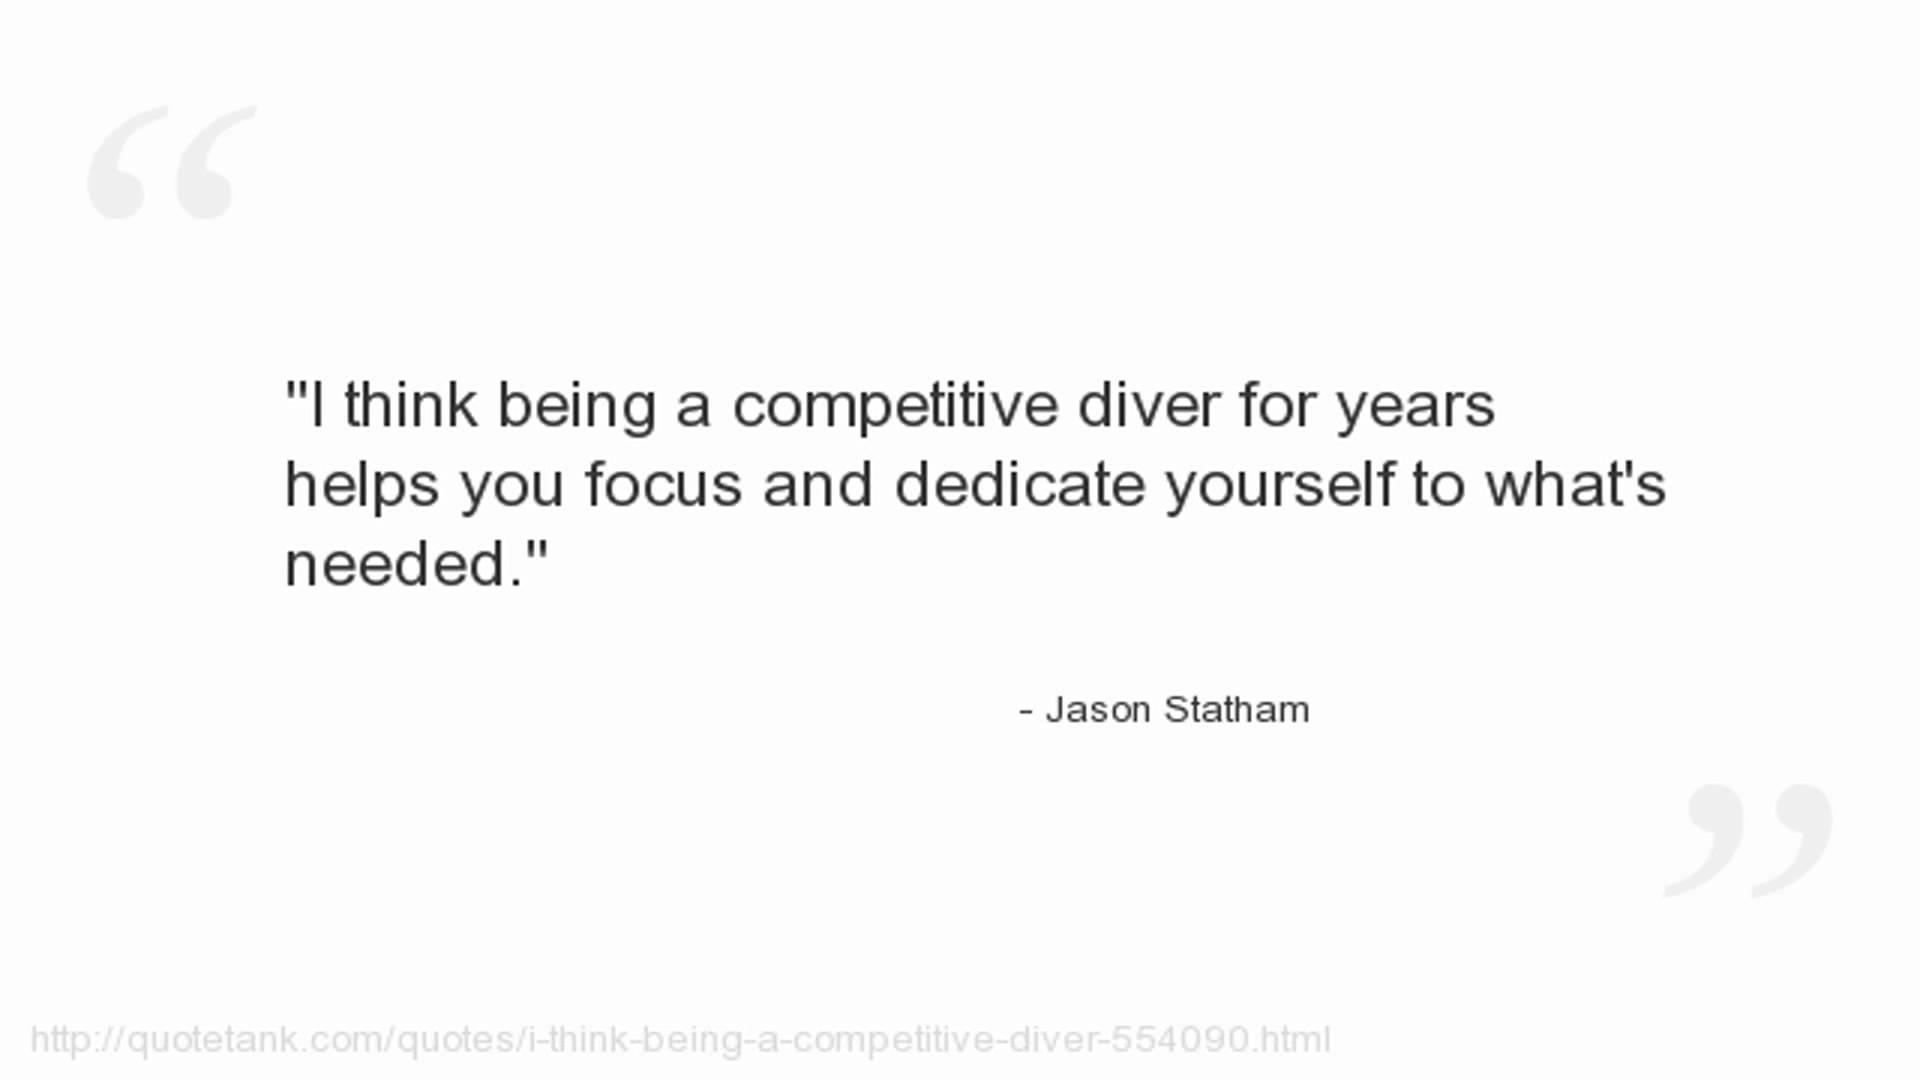 Jason Statham's quote #3